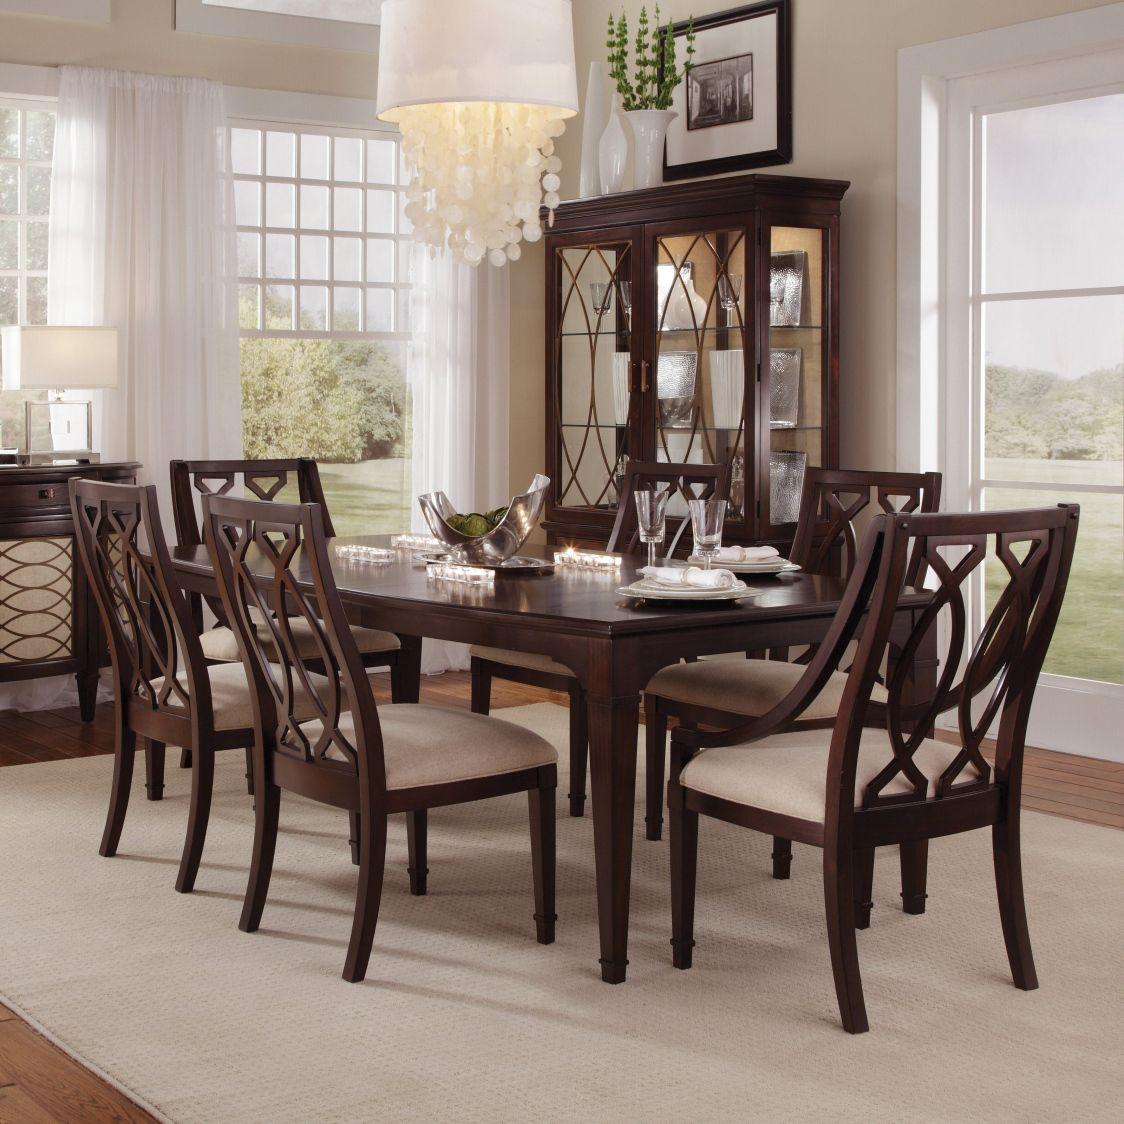 Dark Wood Dining Room Chairs Adorable Dark Wood Dining Room Chairs  Best Master Furniture Check More At Design Ideas